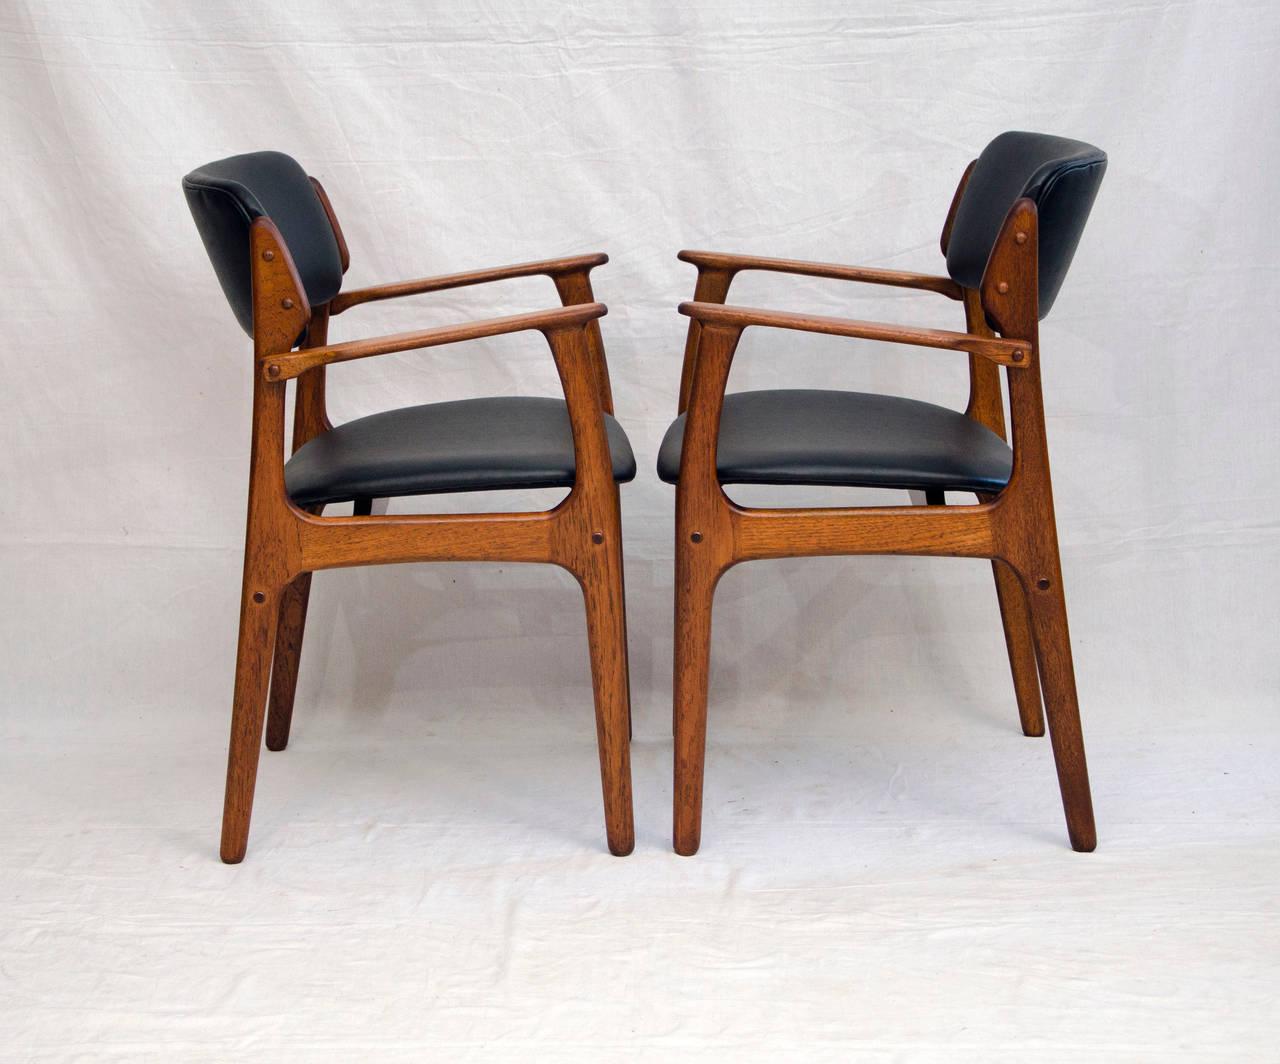 erik buck teak dining chairs photo - 6